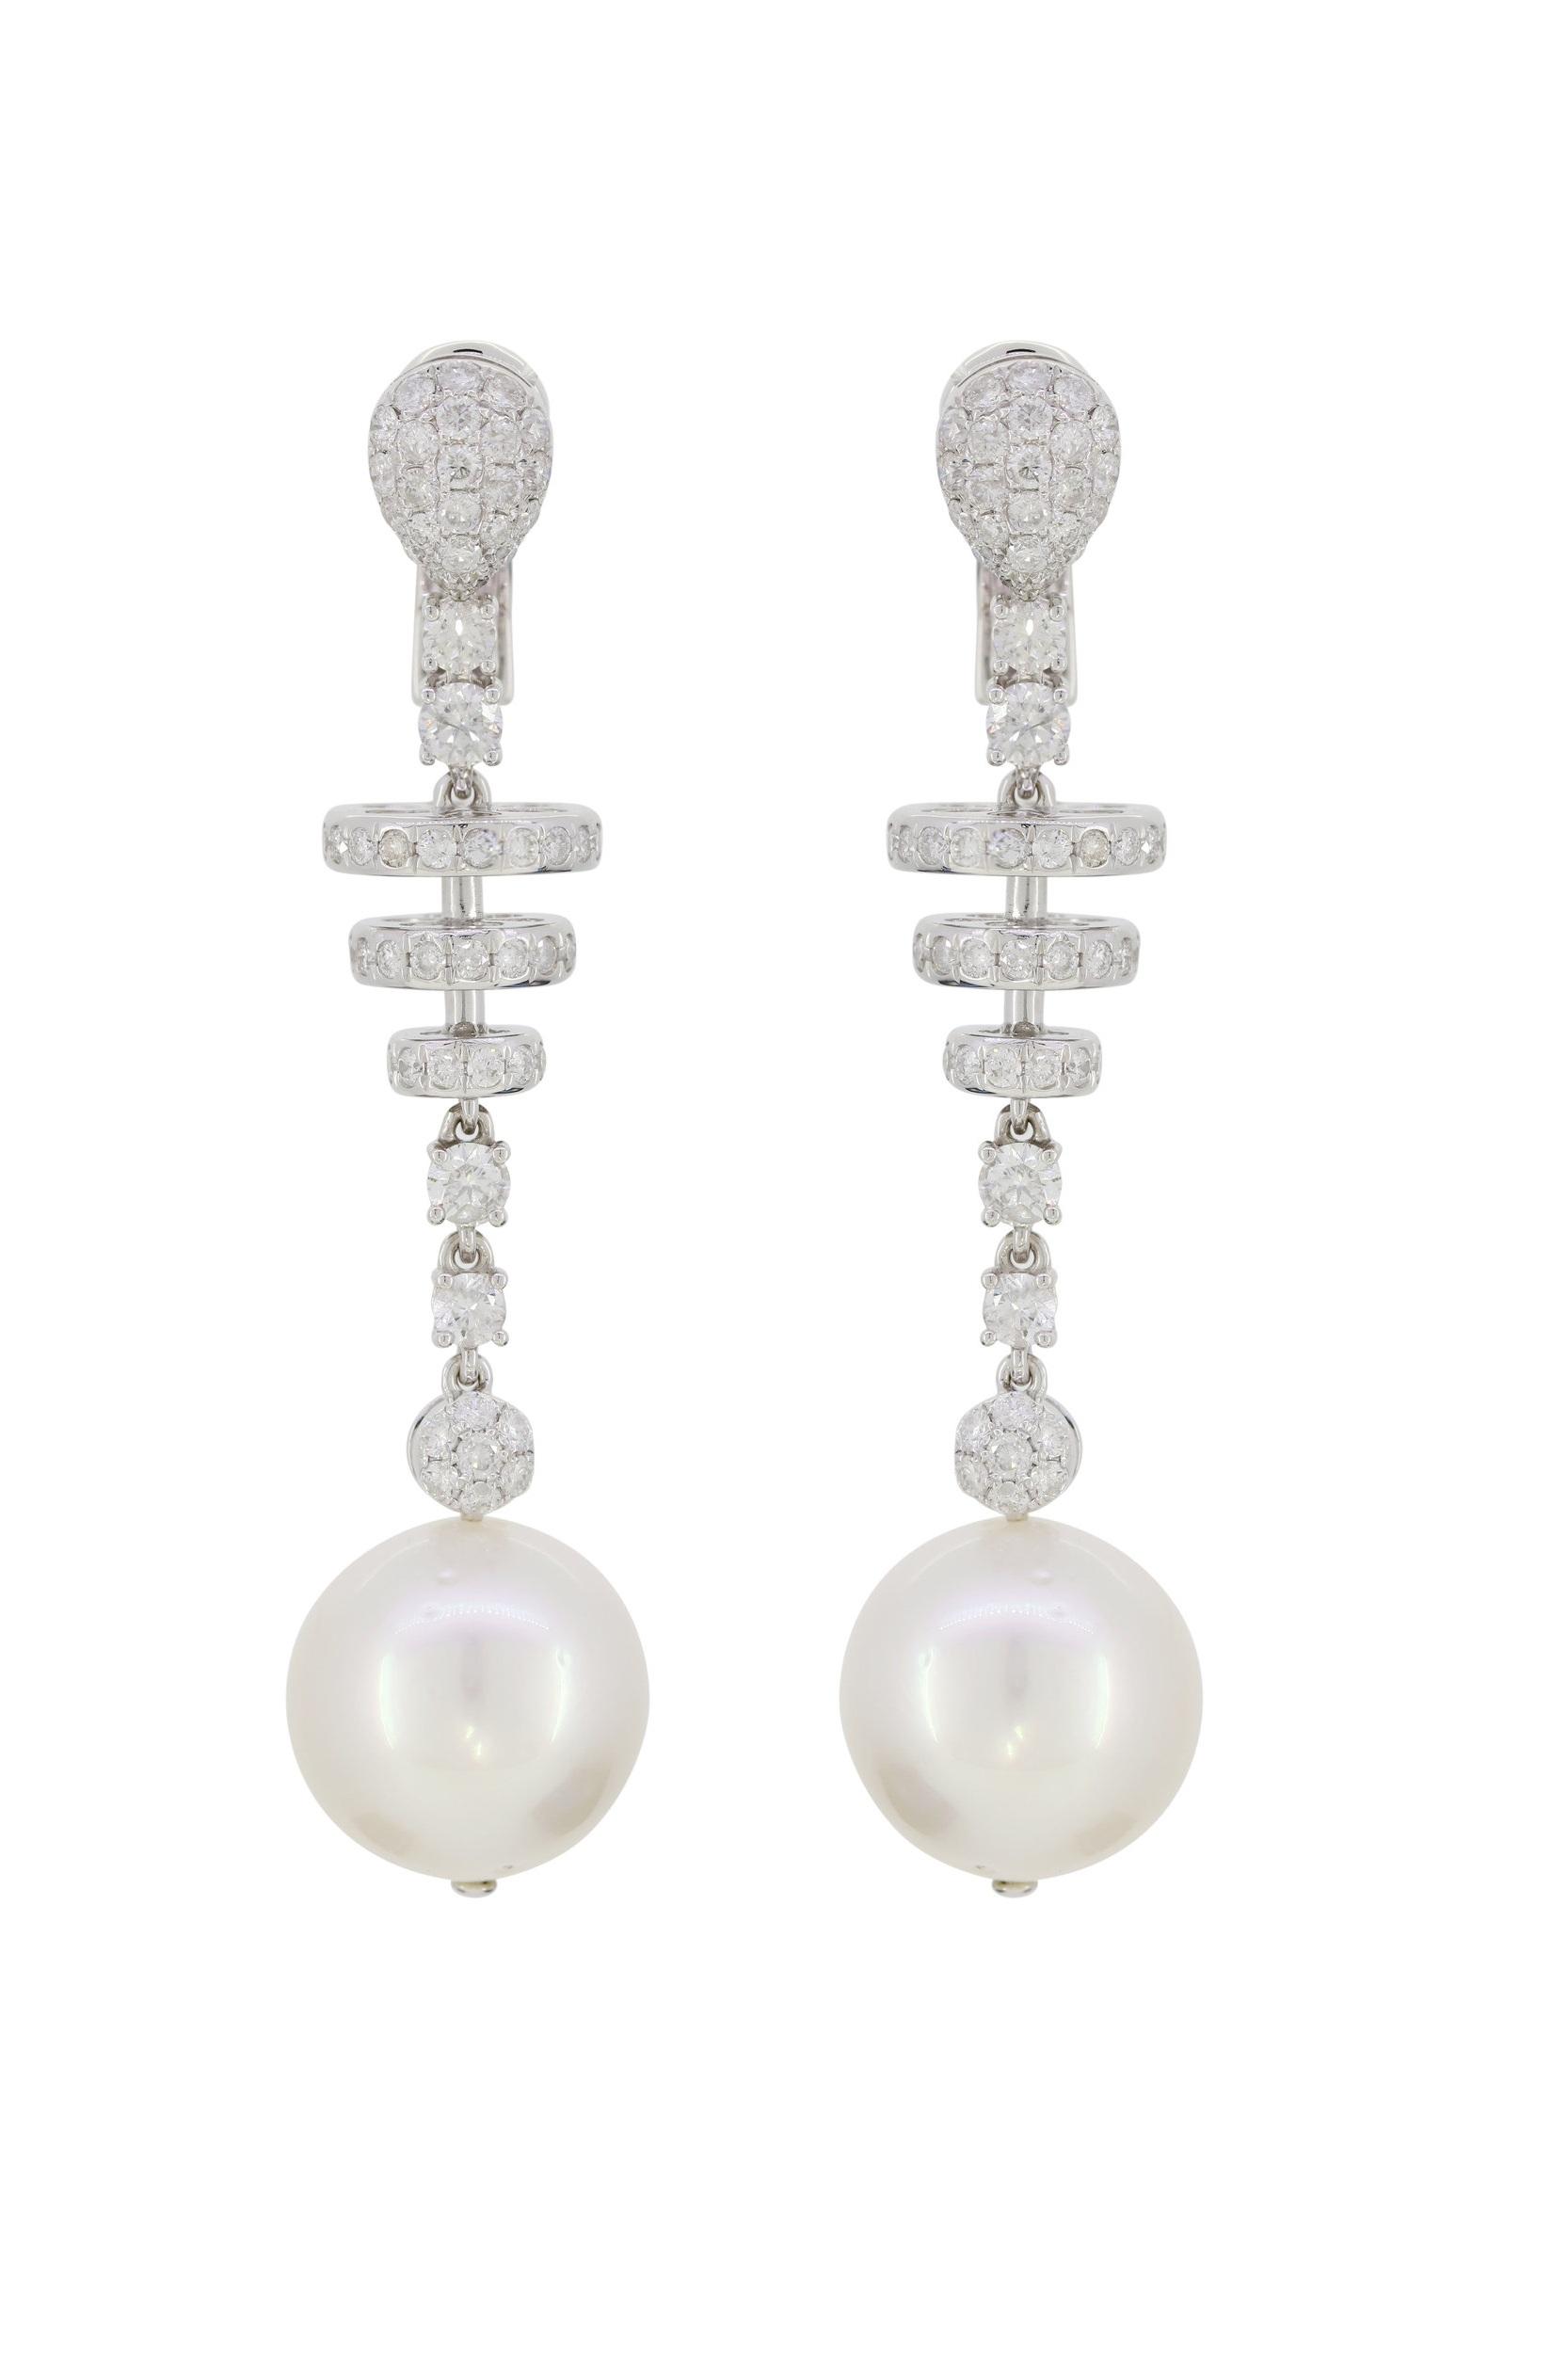 Stones:   -Akoya Pearl  -White Diamond Round Full Cut